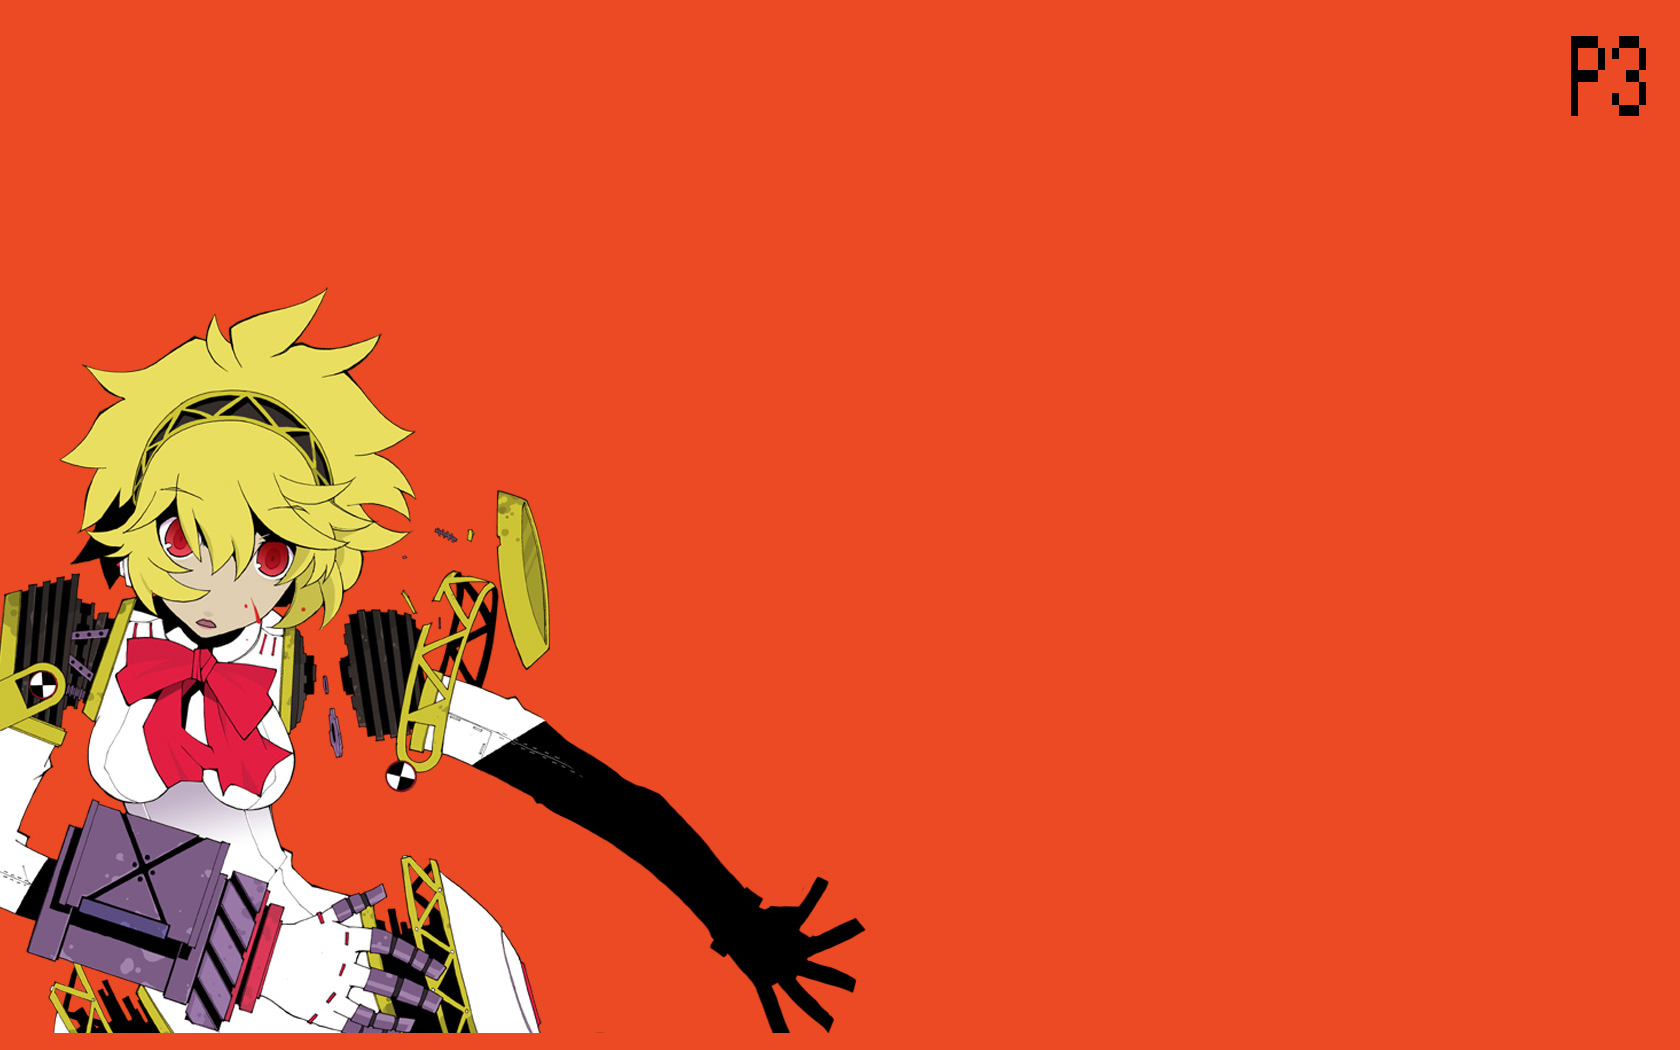 Persona 3 By Jirakun イラスト ペルソナ5 ジョーカー アニメ絵